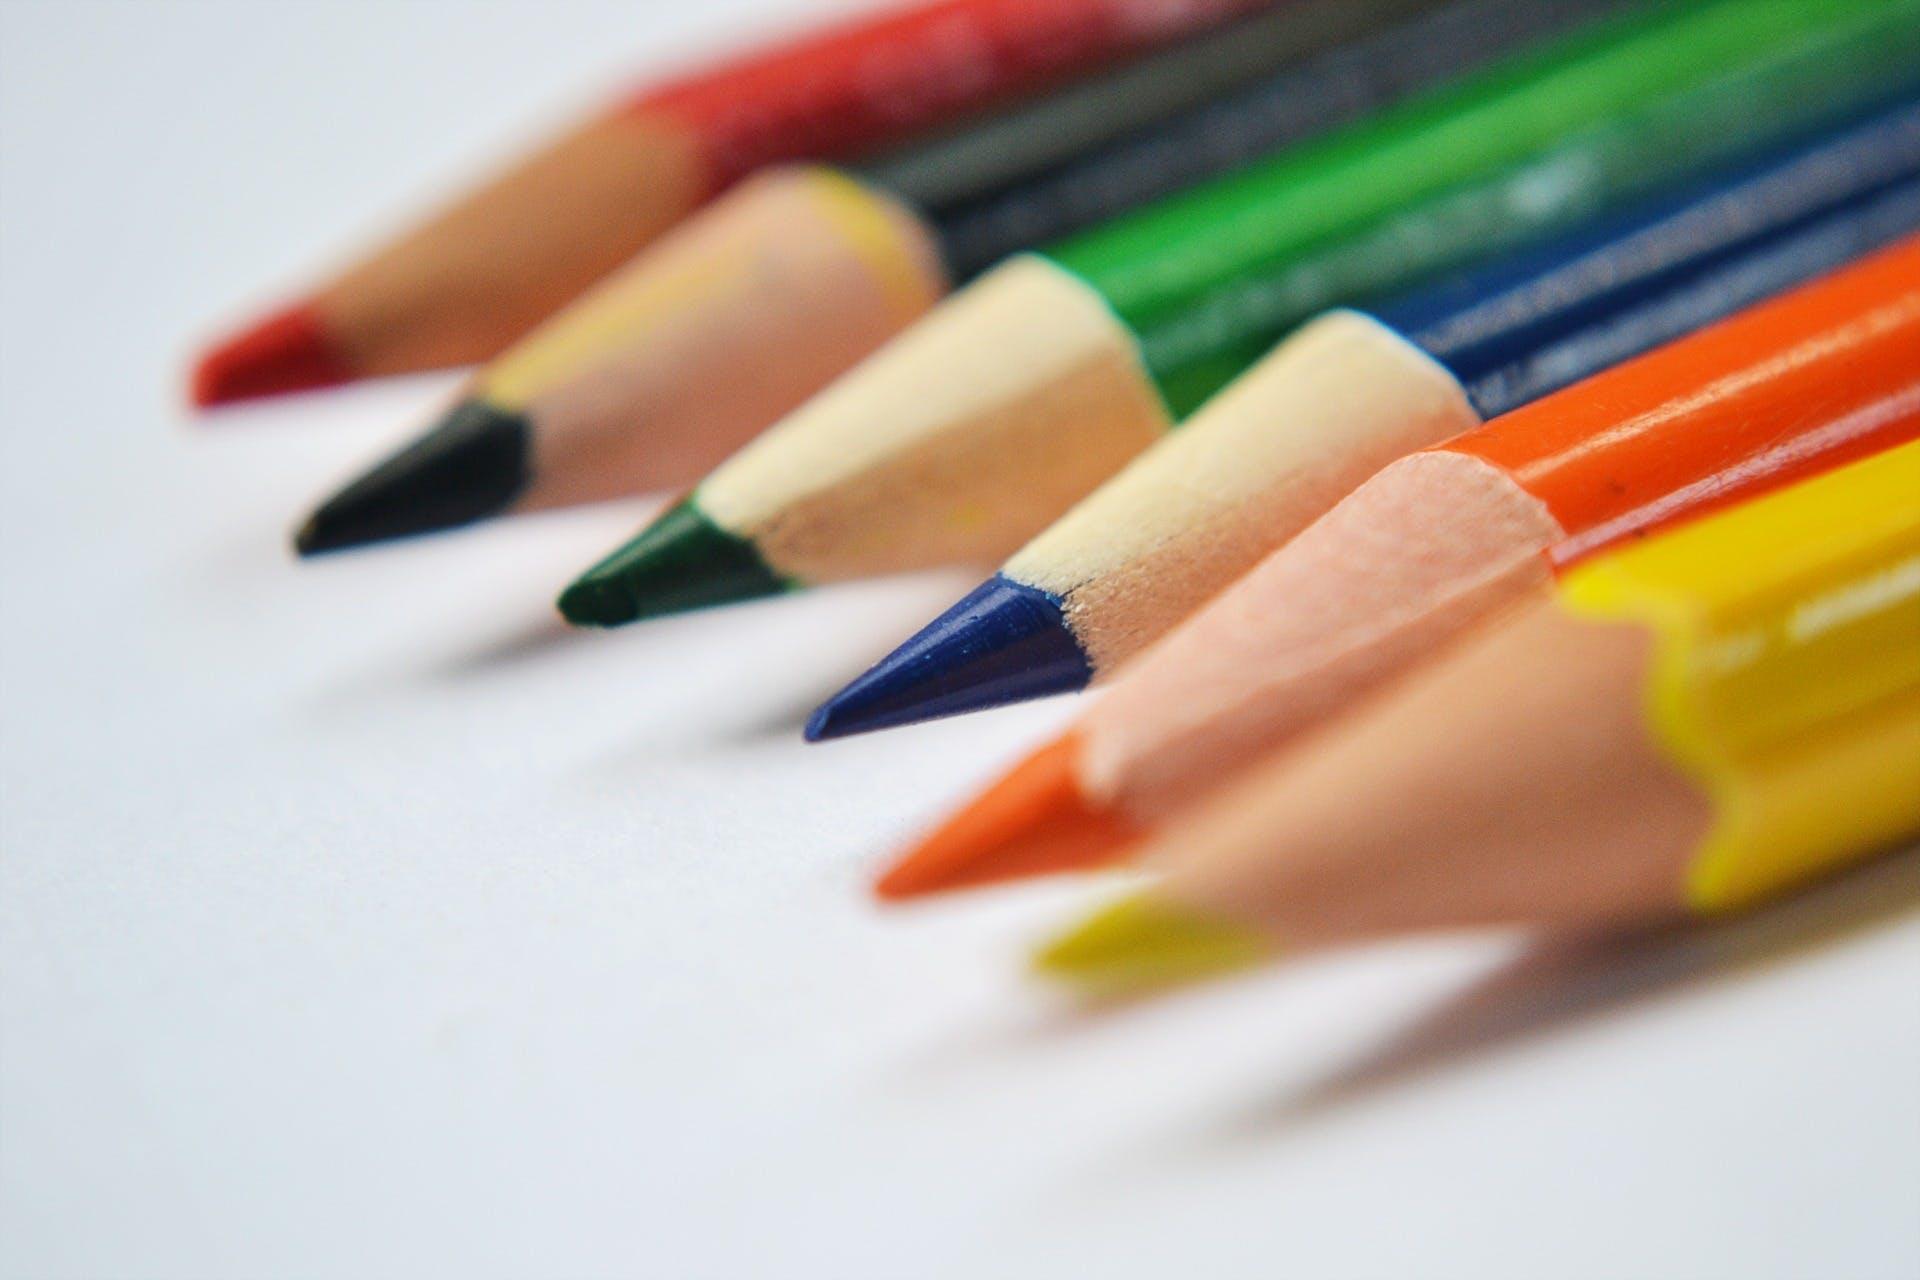 blur, close-up, colored pencils